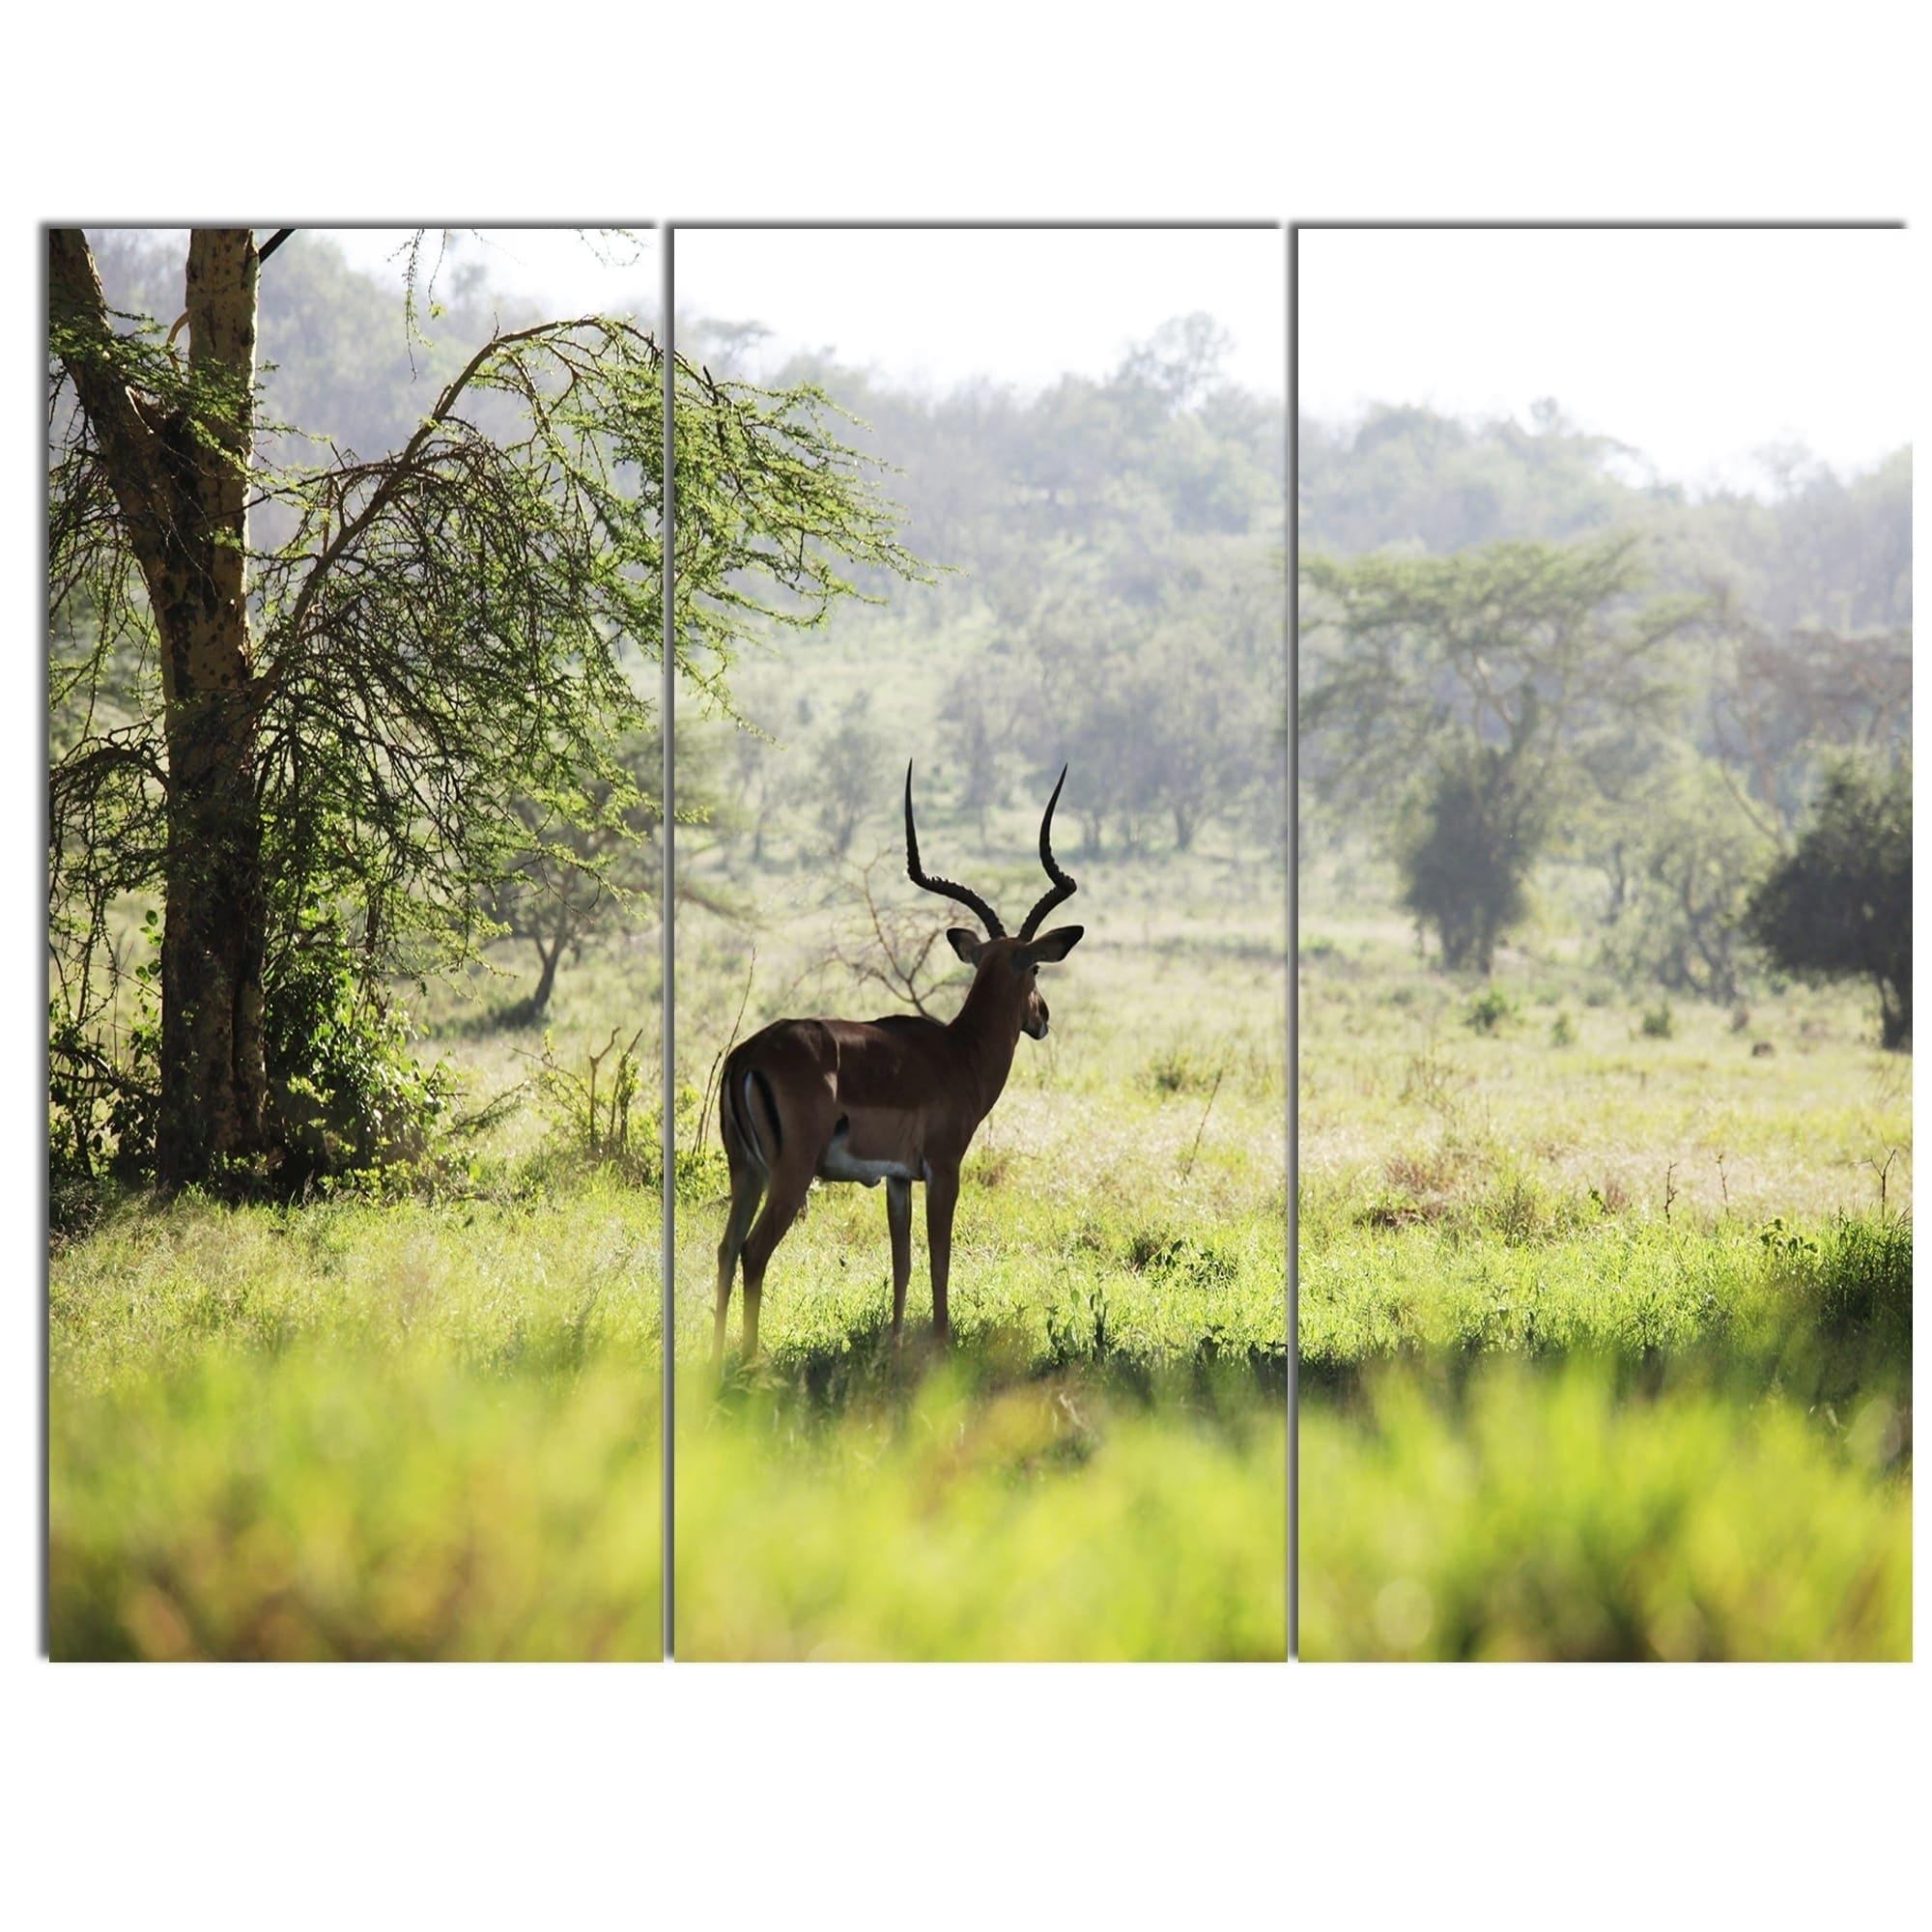 Phase1 Designart \'Solitary Antelope in Green Park\' African Landscape ...